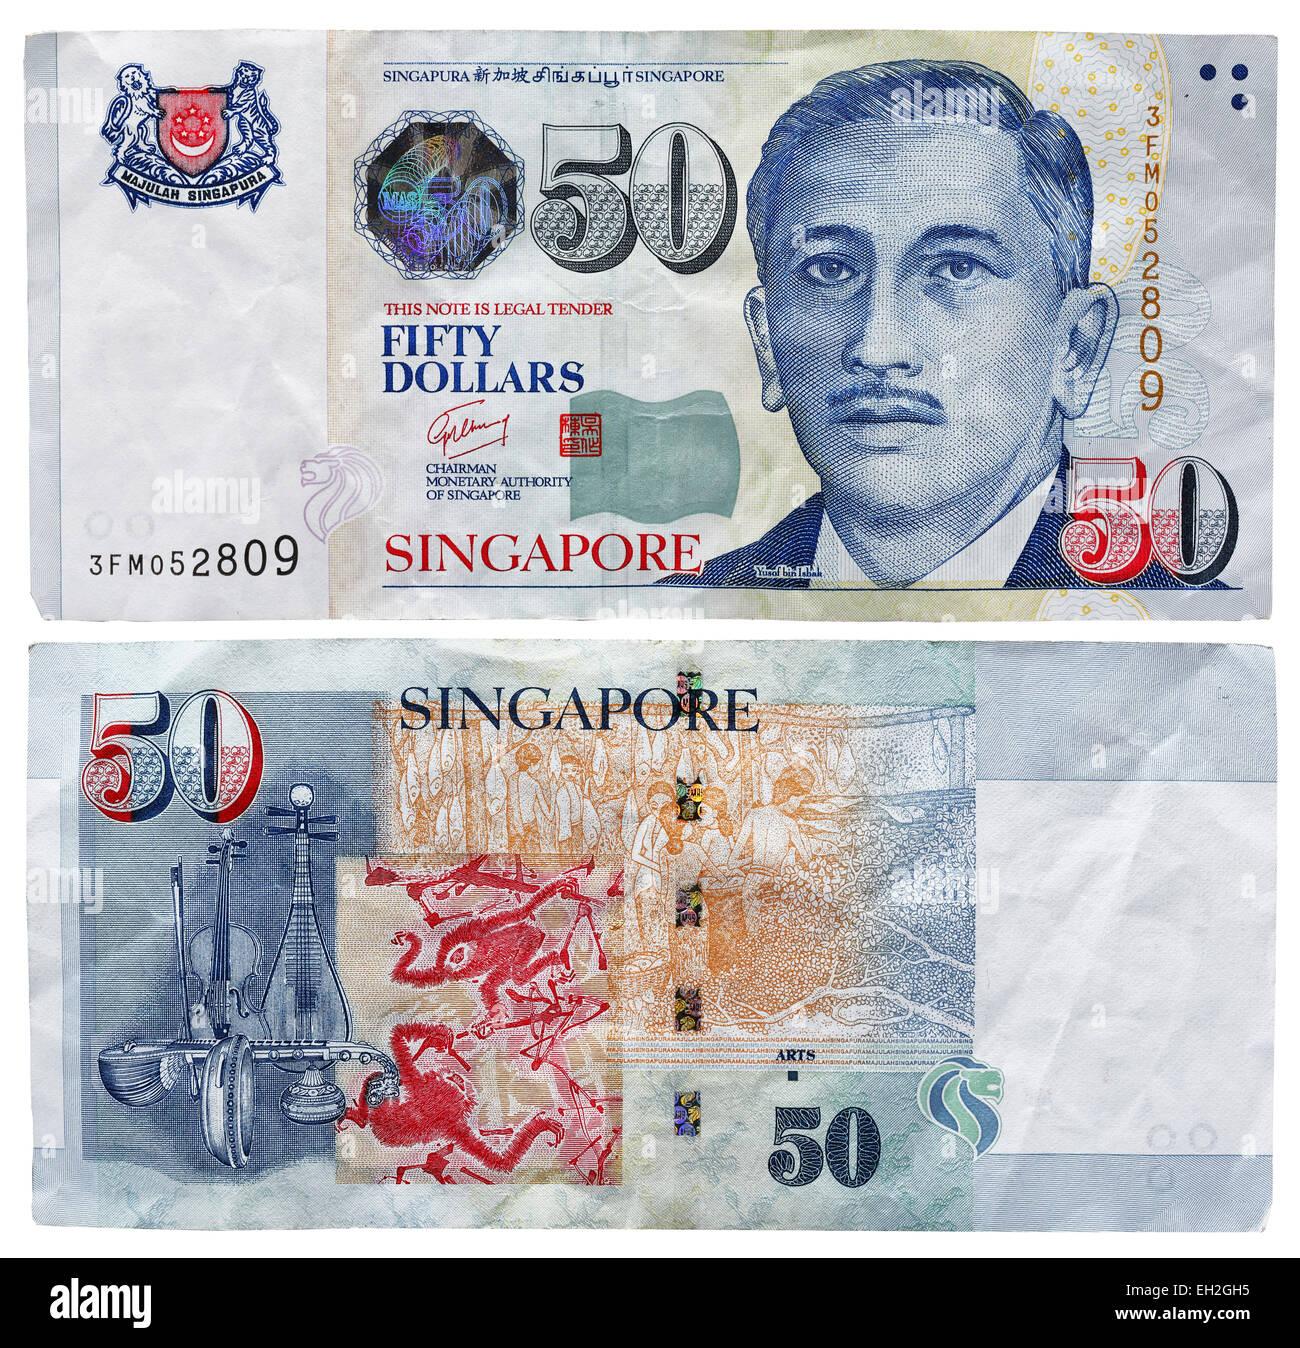 50 Fifty Dollar Bill Note Stockfotos & 50 Fifty Dollar Bill Note ...